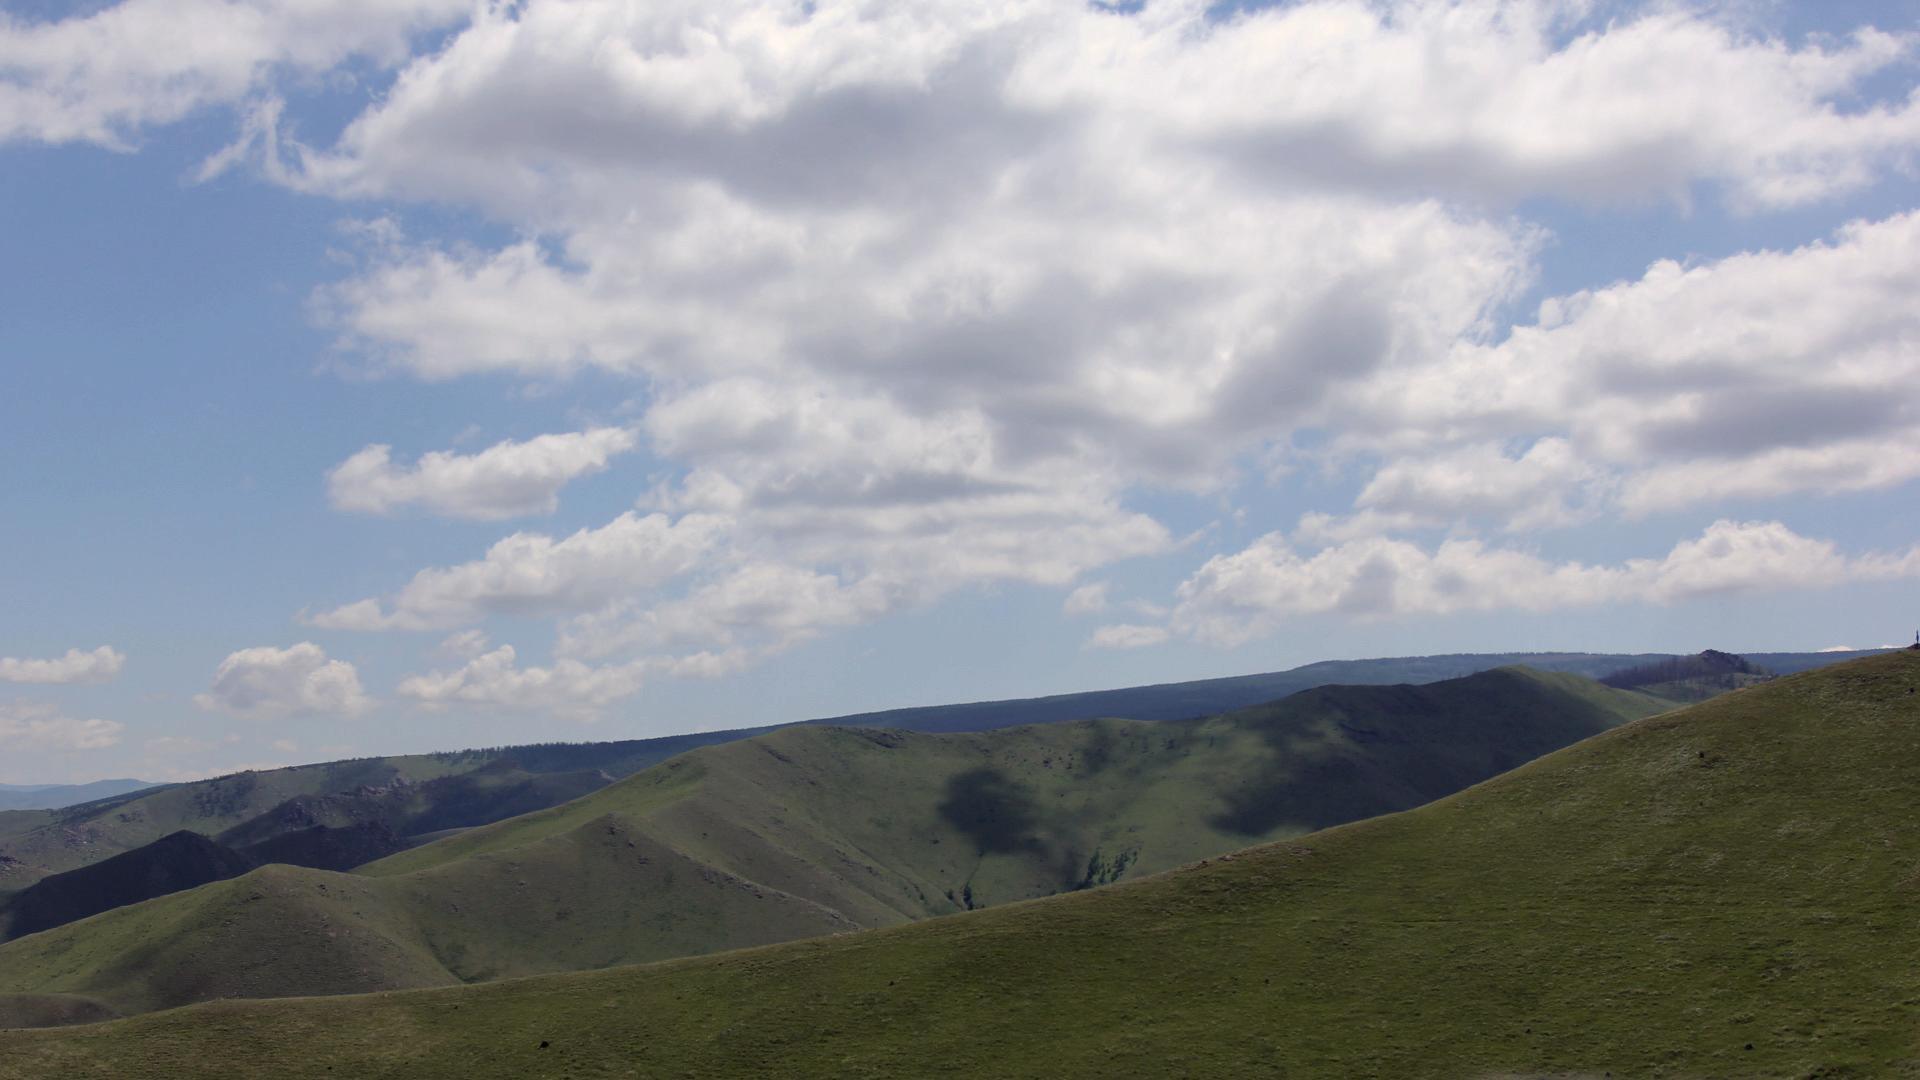 mongolia hills.jpg